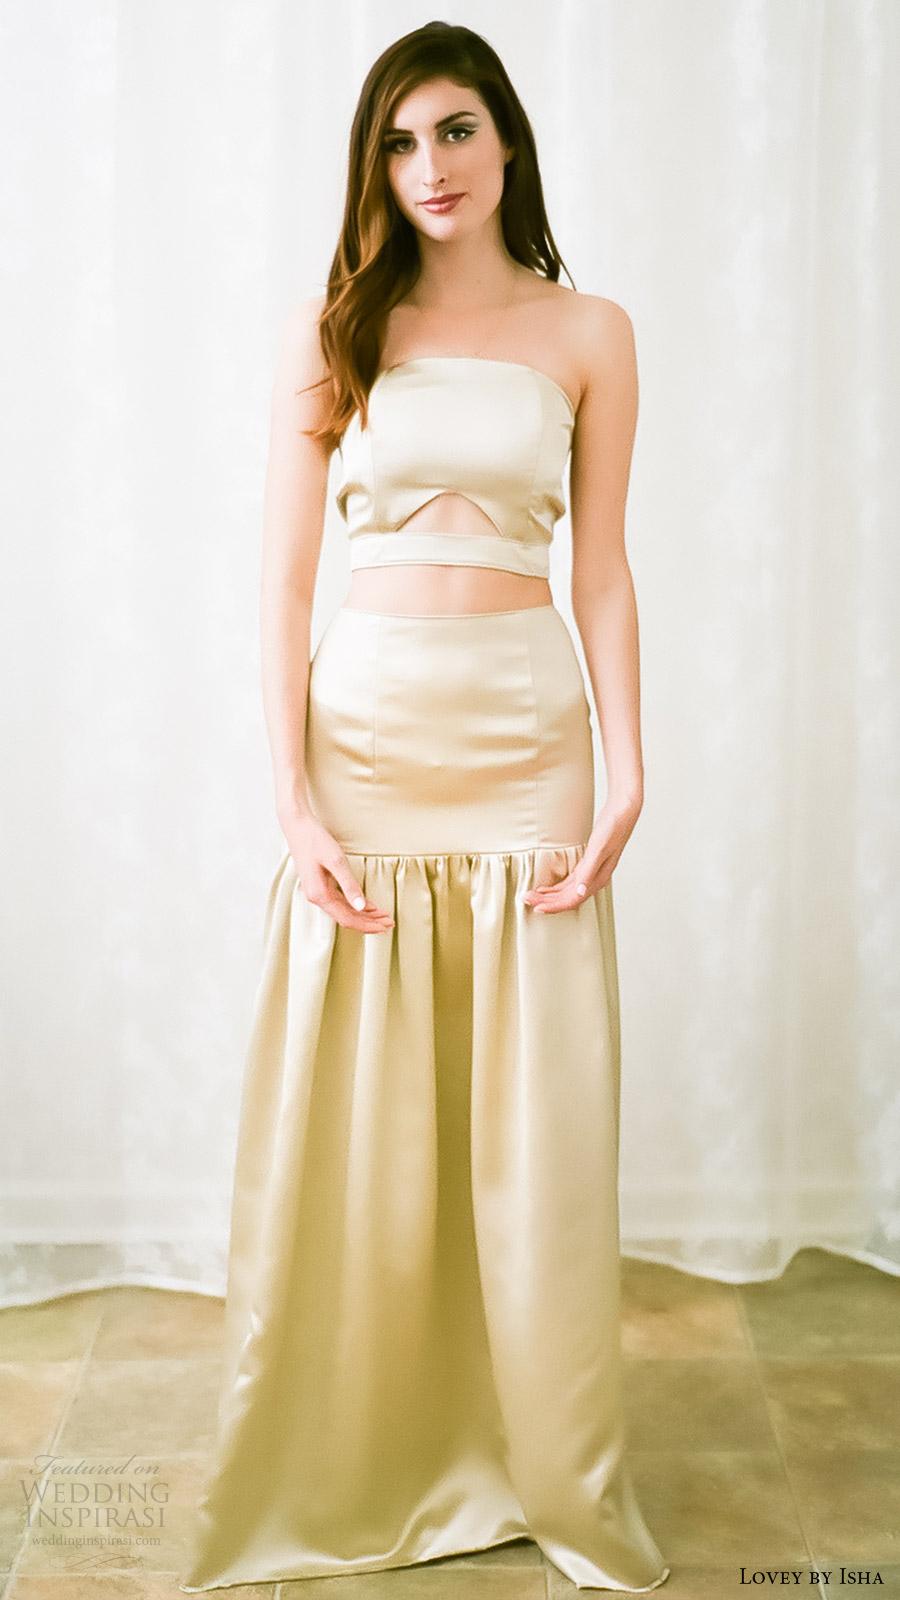 Lovey by isha spring 2016 wedding dresses wedding inspirasi for Usa made wedding dresses